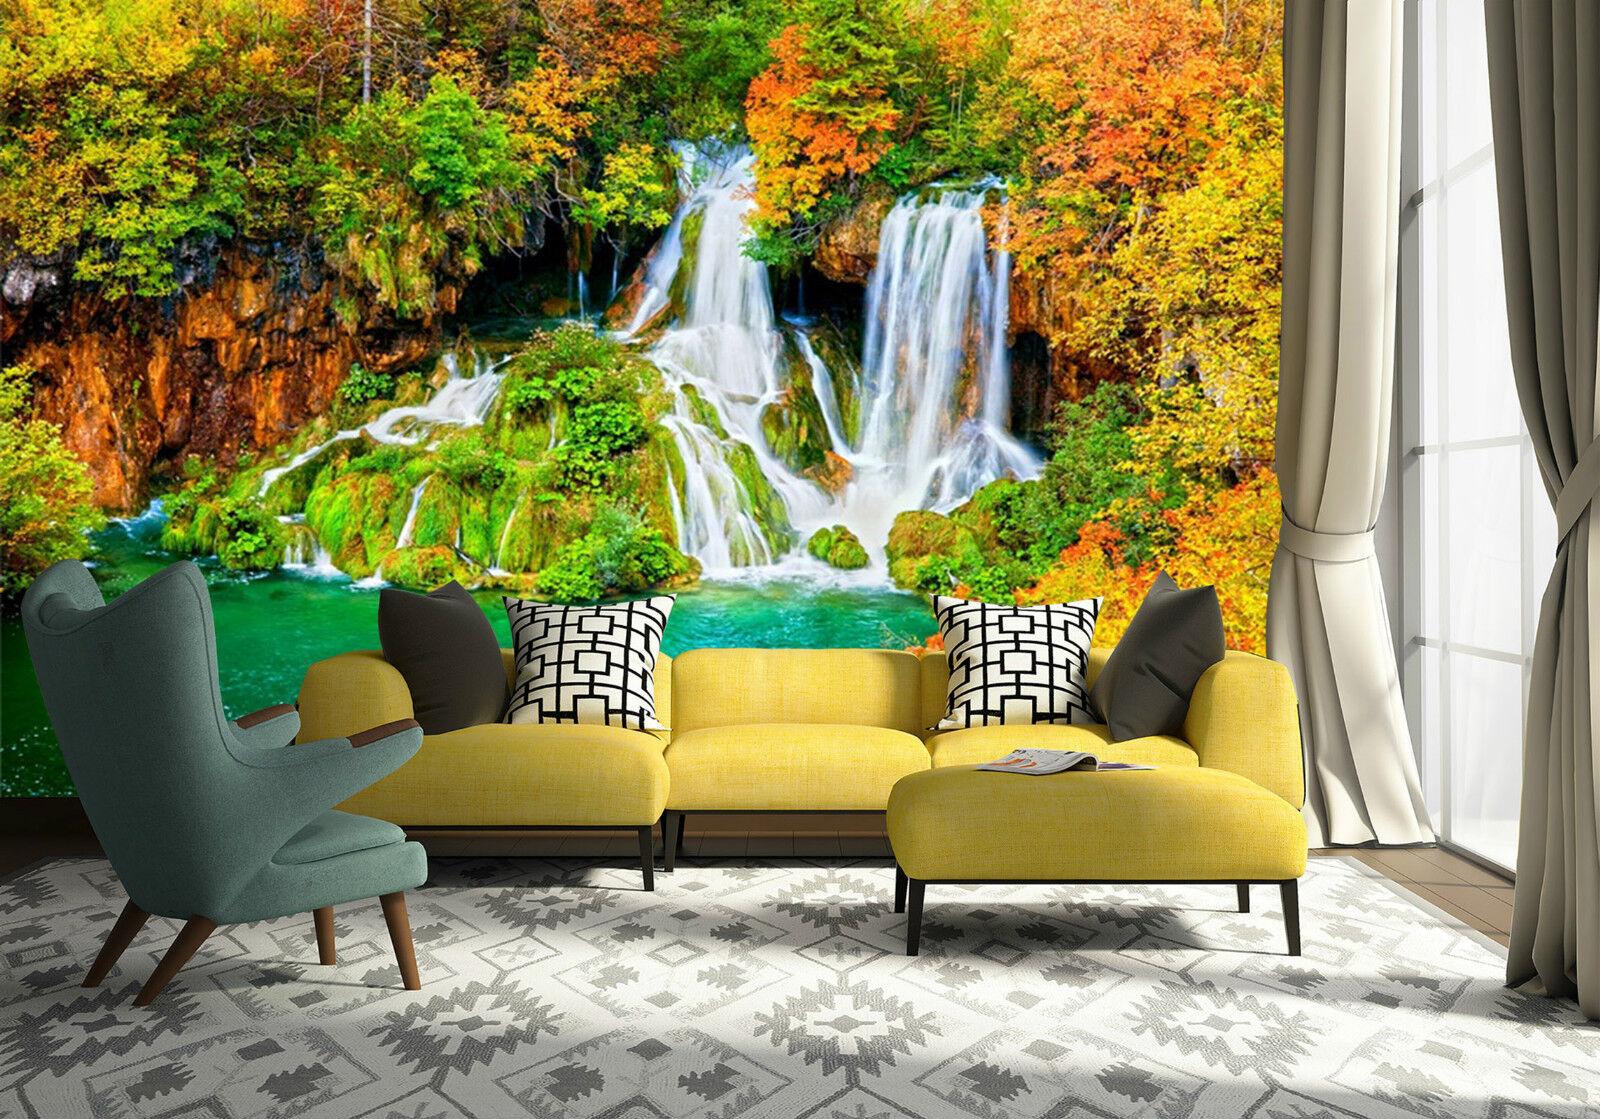 3D Herbstes 6766 Fototapeten Wandbild Fototapete Bild Tapete Familie Kinder DE